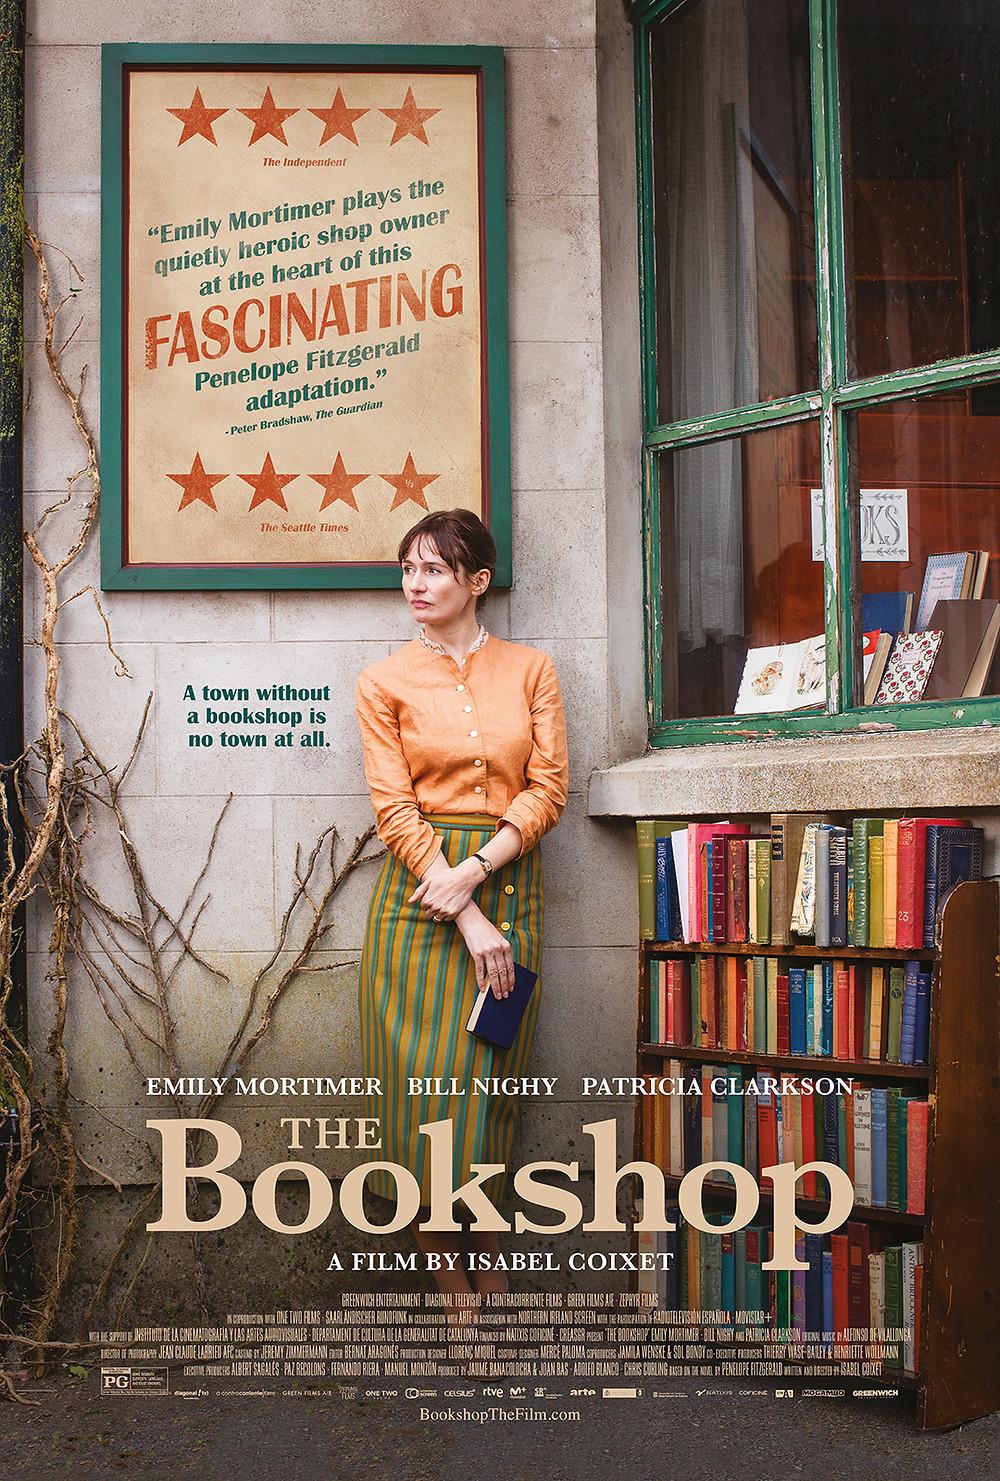 The Bookshop movie graphic